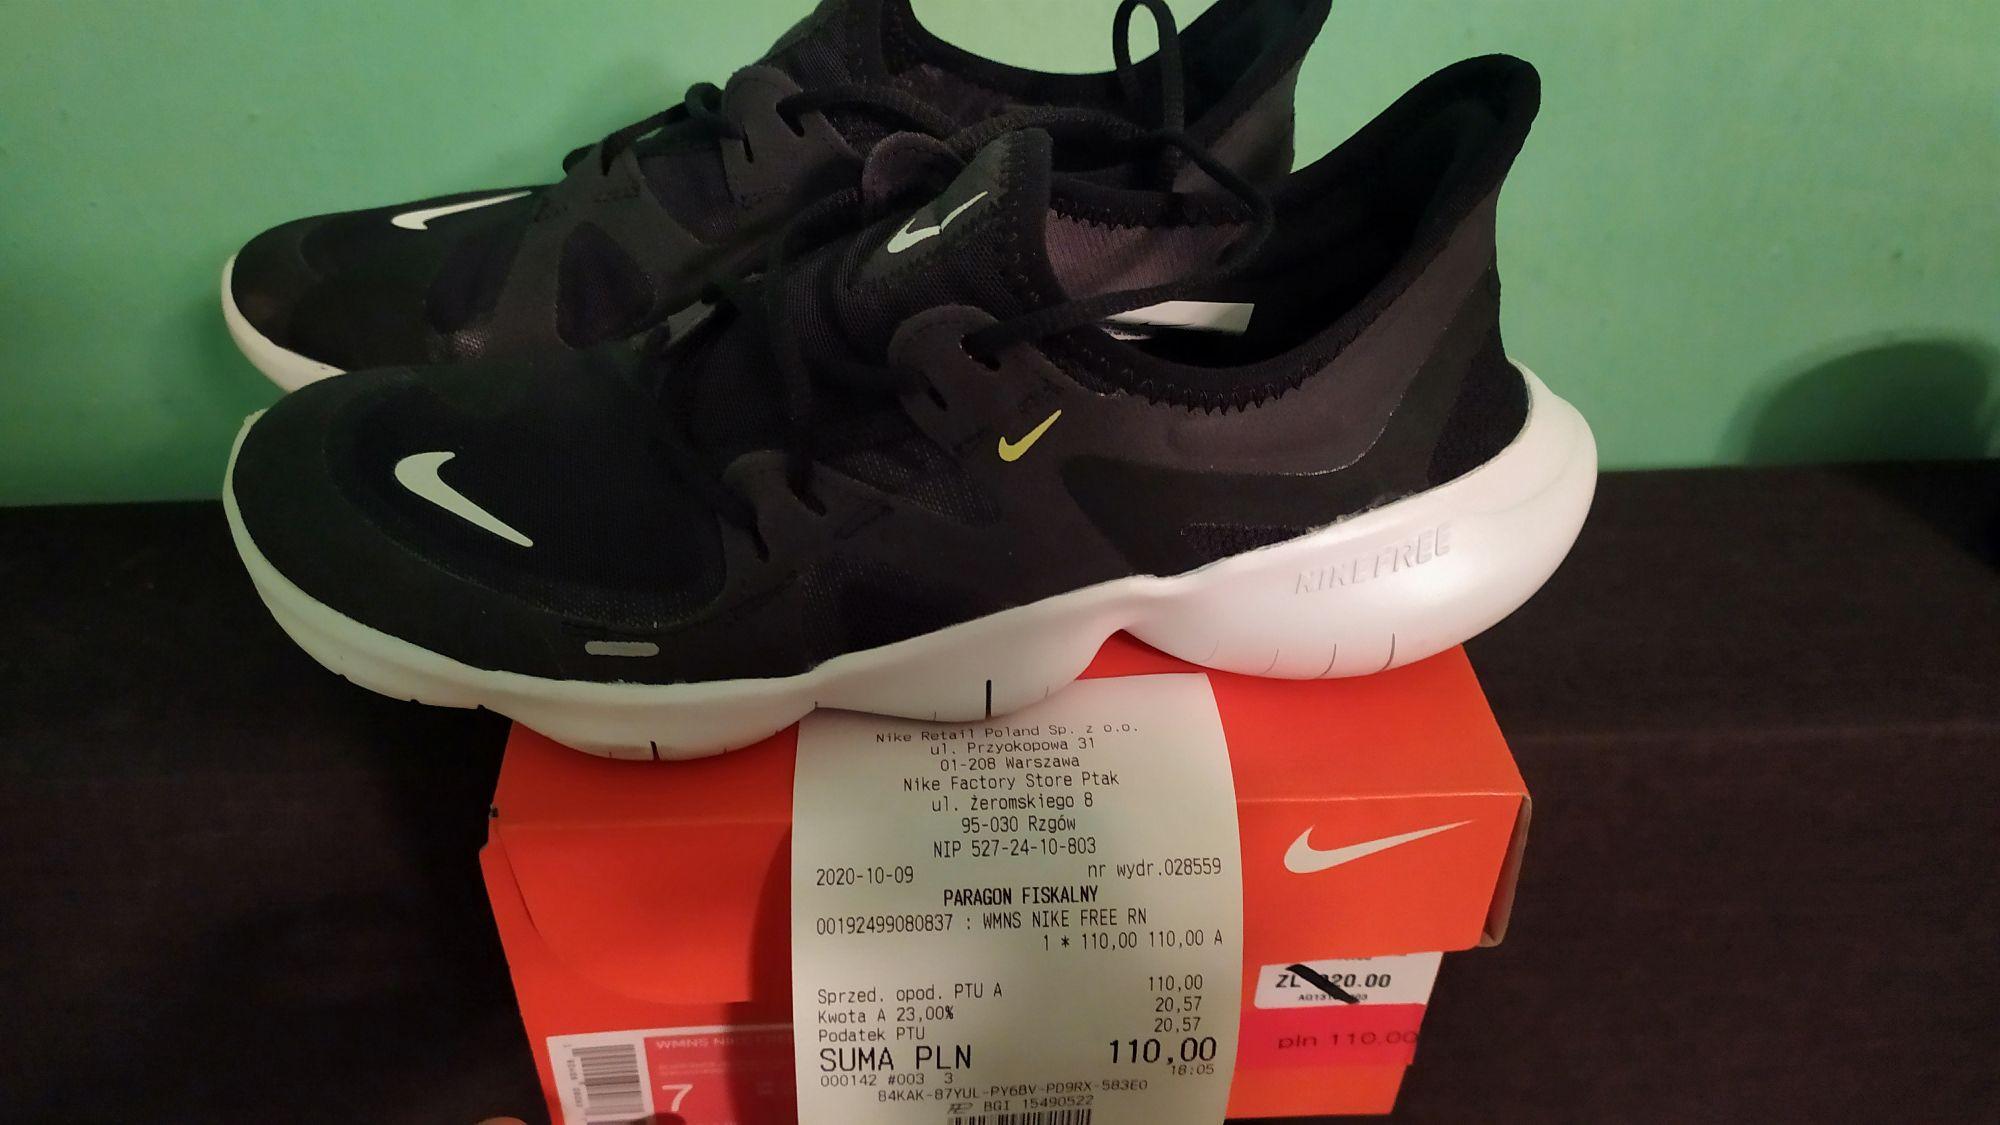 Buty damskie Nike free RN 5.0 2 Ptak Outlet